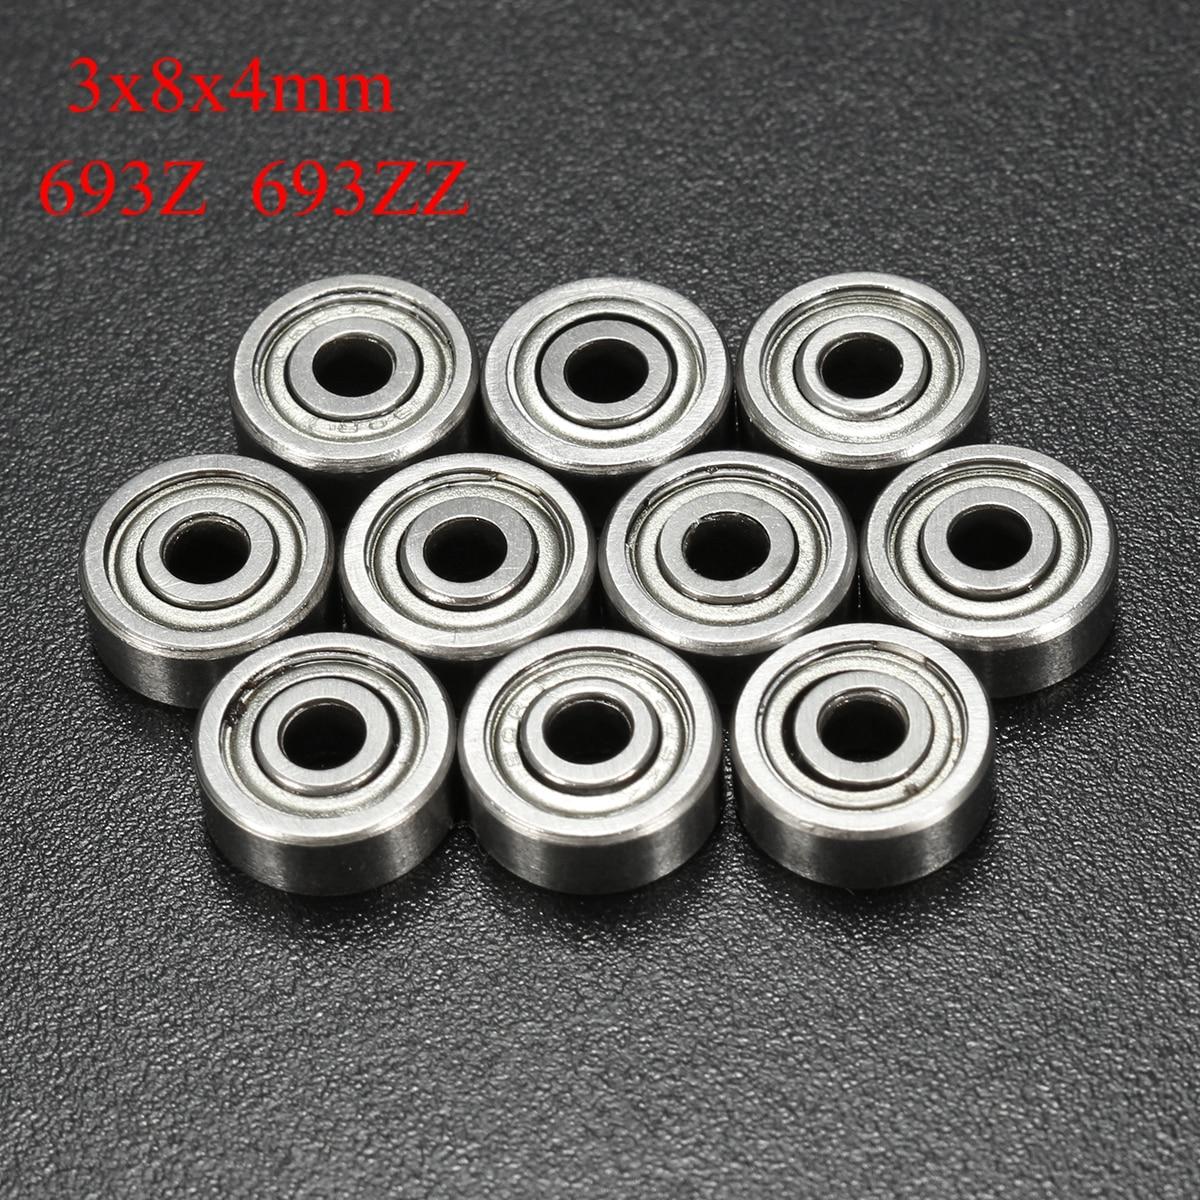 10pcs/Set 693ZZ Miniature Ball Bearings 3*8*4mm Small Double Shielded Miniature Metal Steel Bearing 10pcs lot 688zz miniature ball bearings metal double shielded miniature metal steel bearing 8x16x5mm